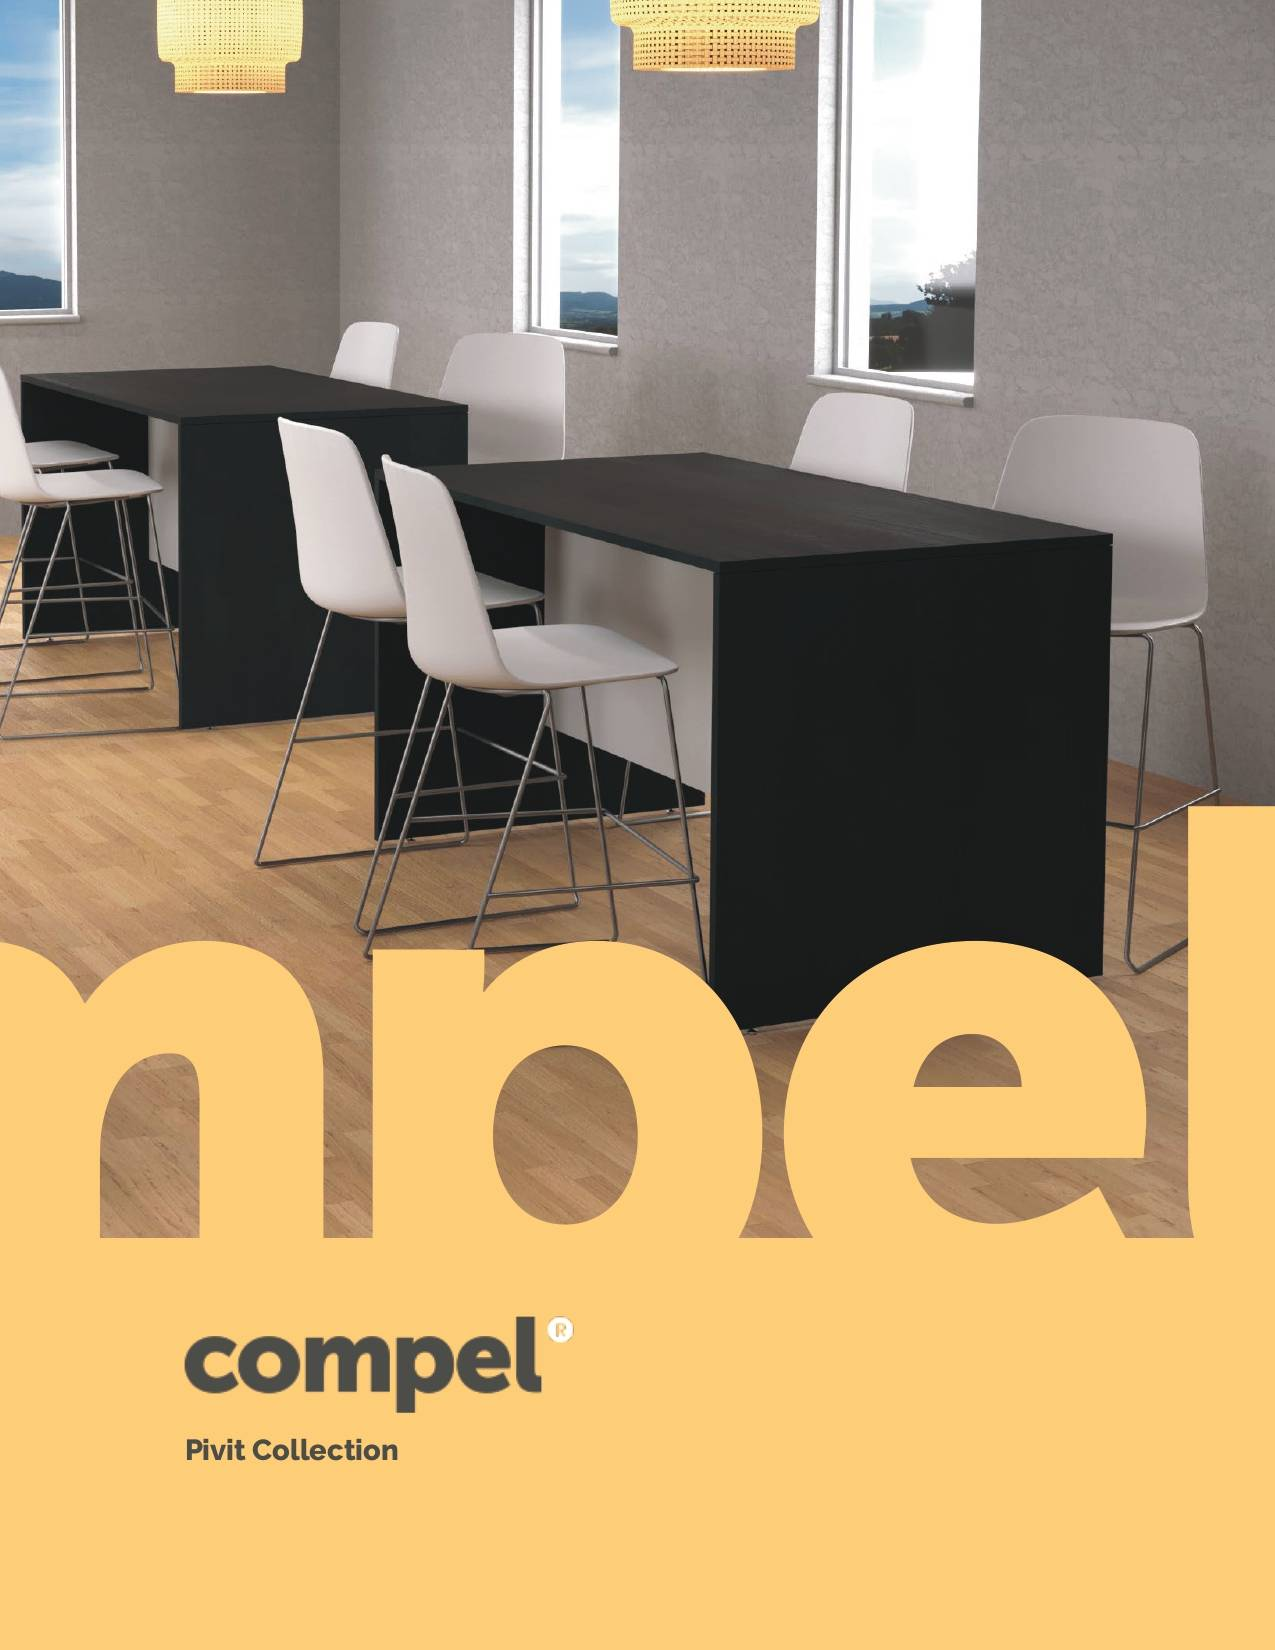 Compel Furniture Pivit Collection Brochure